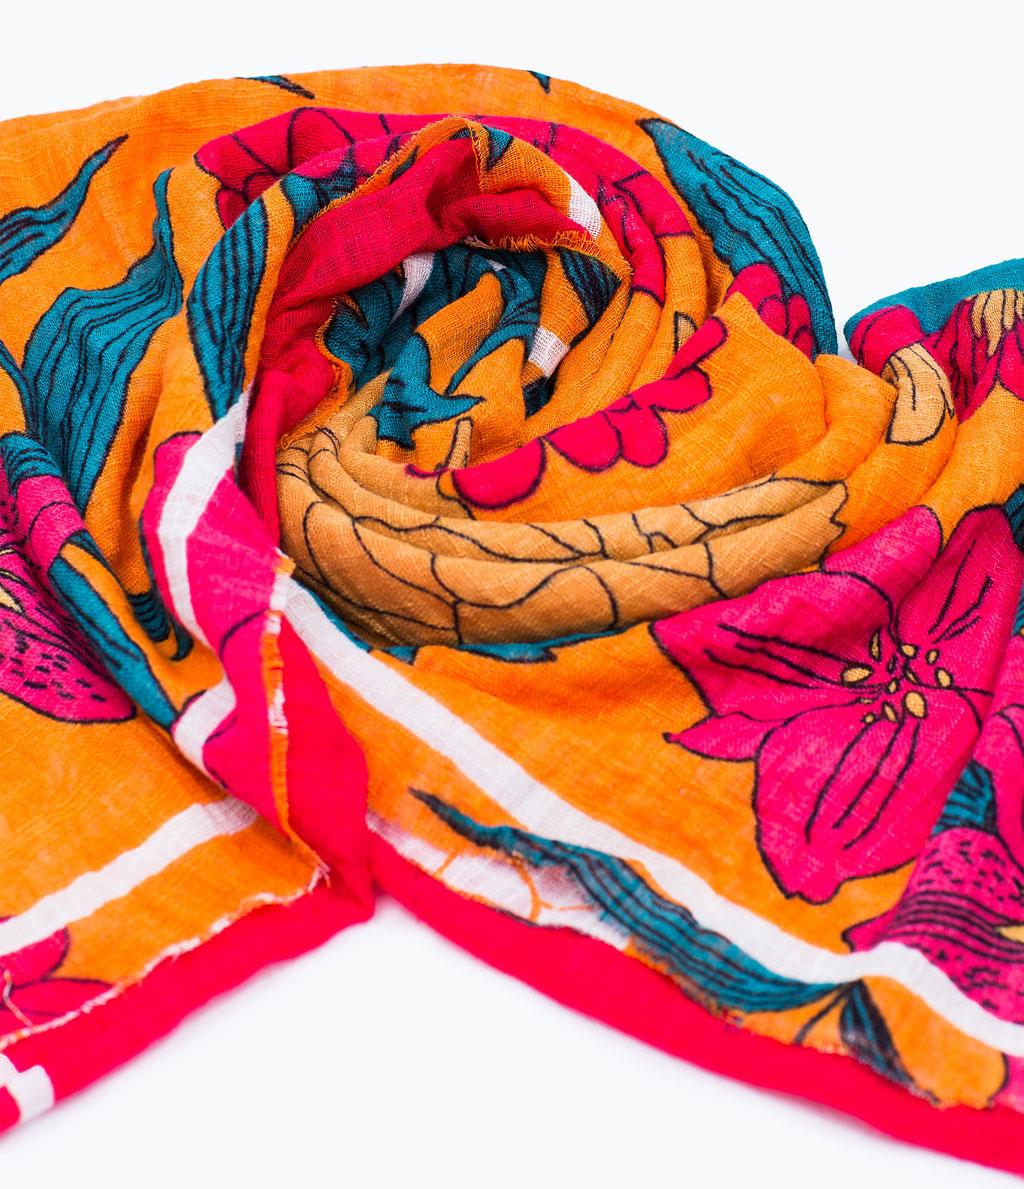 Floral Print Scarf, $29.90